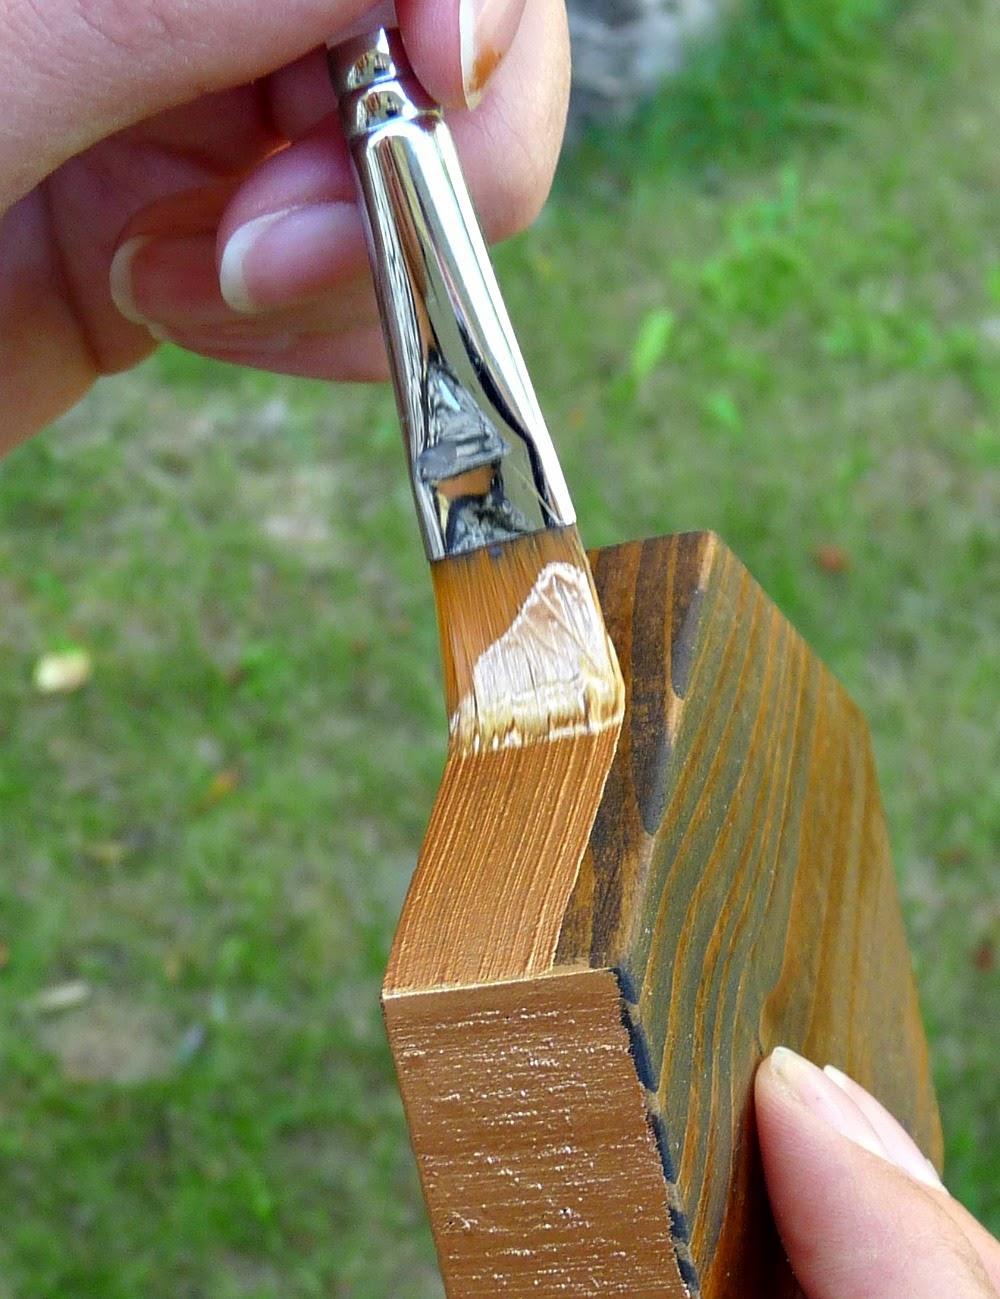 Copper painted edge